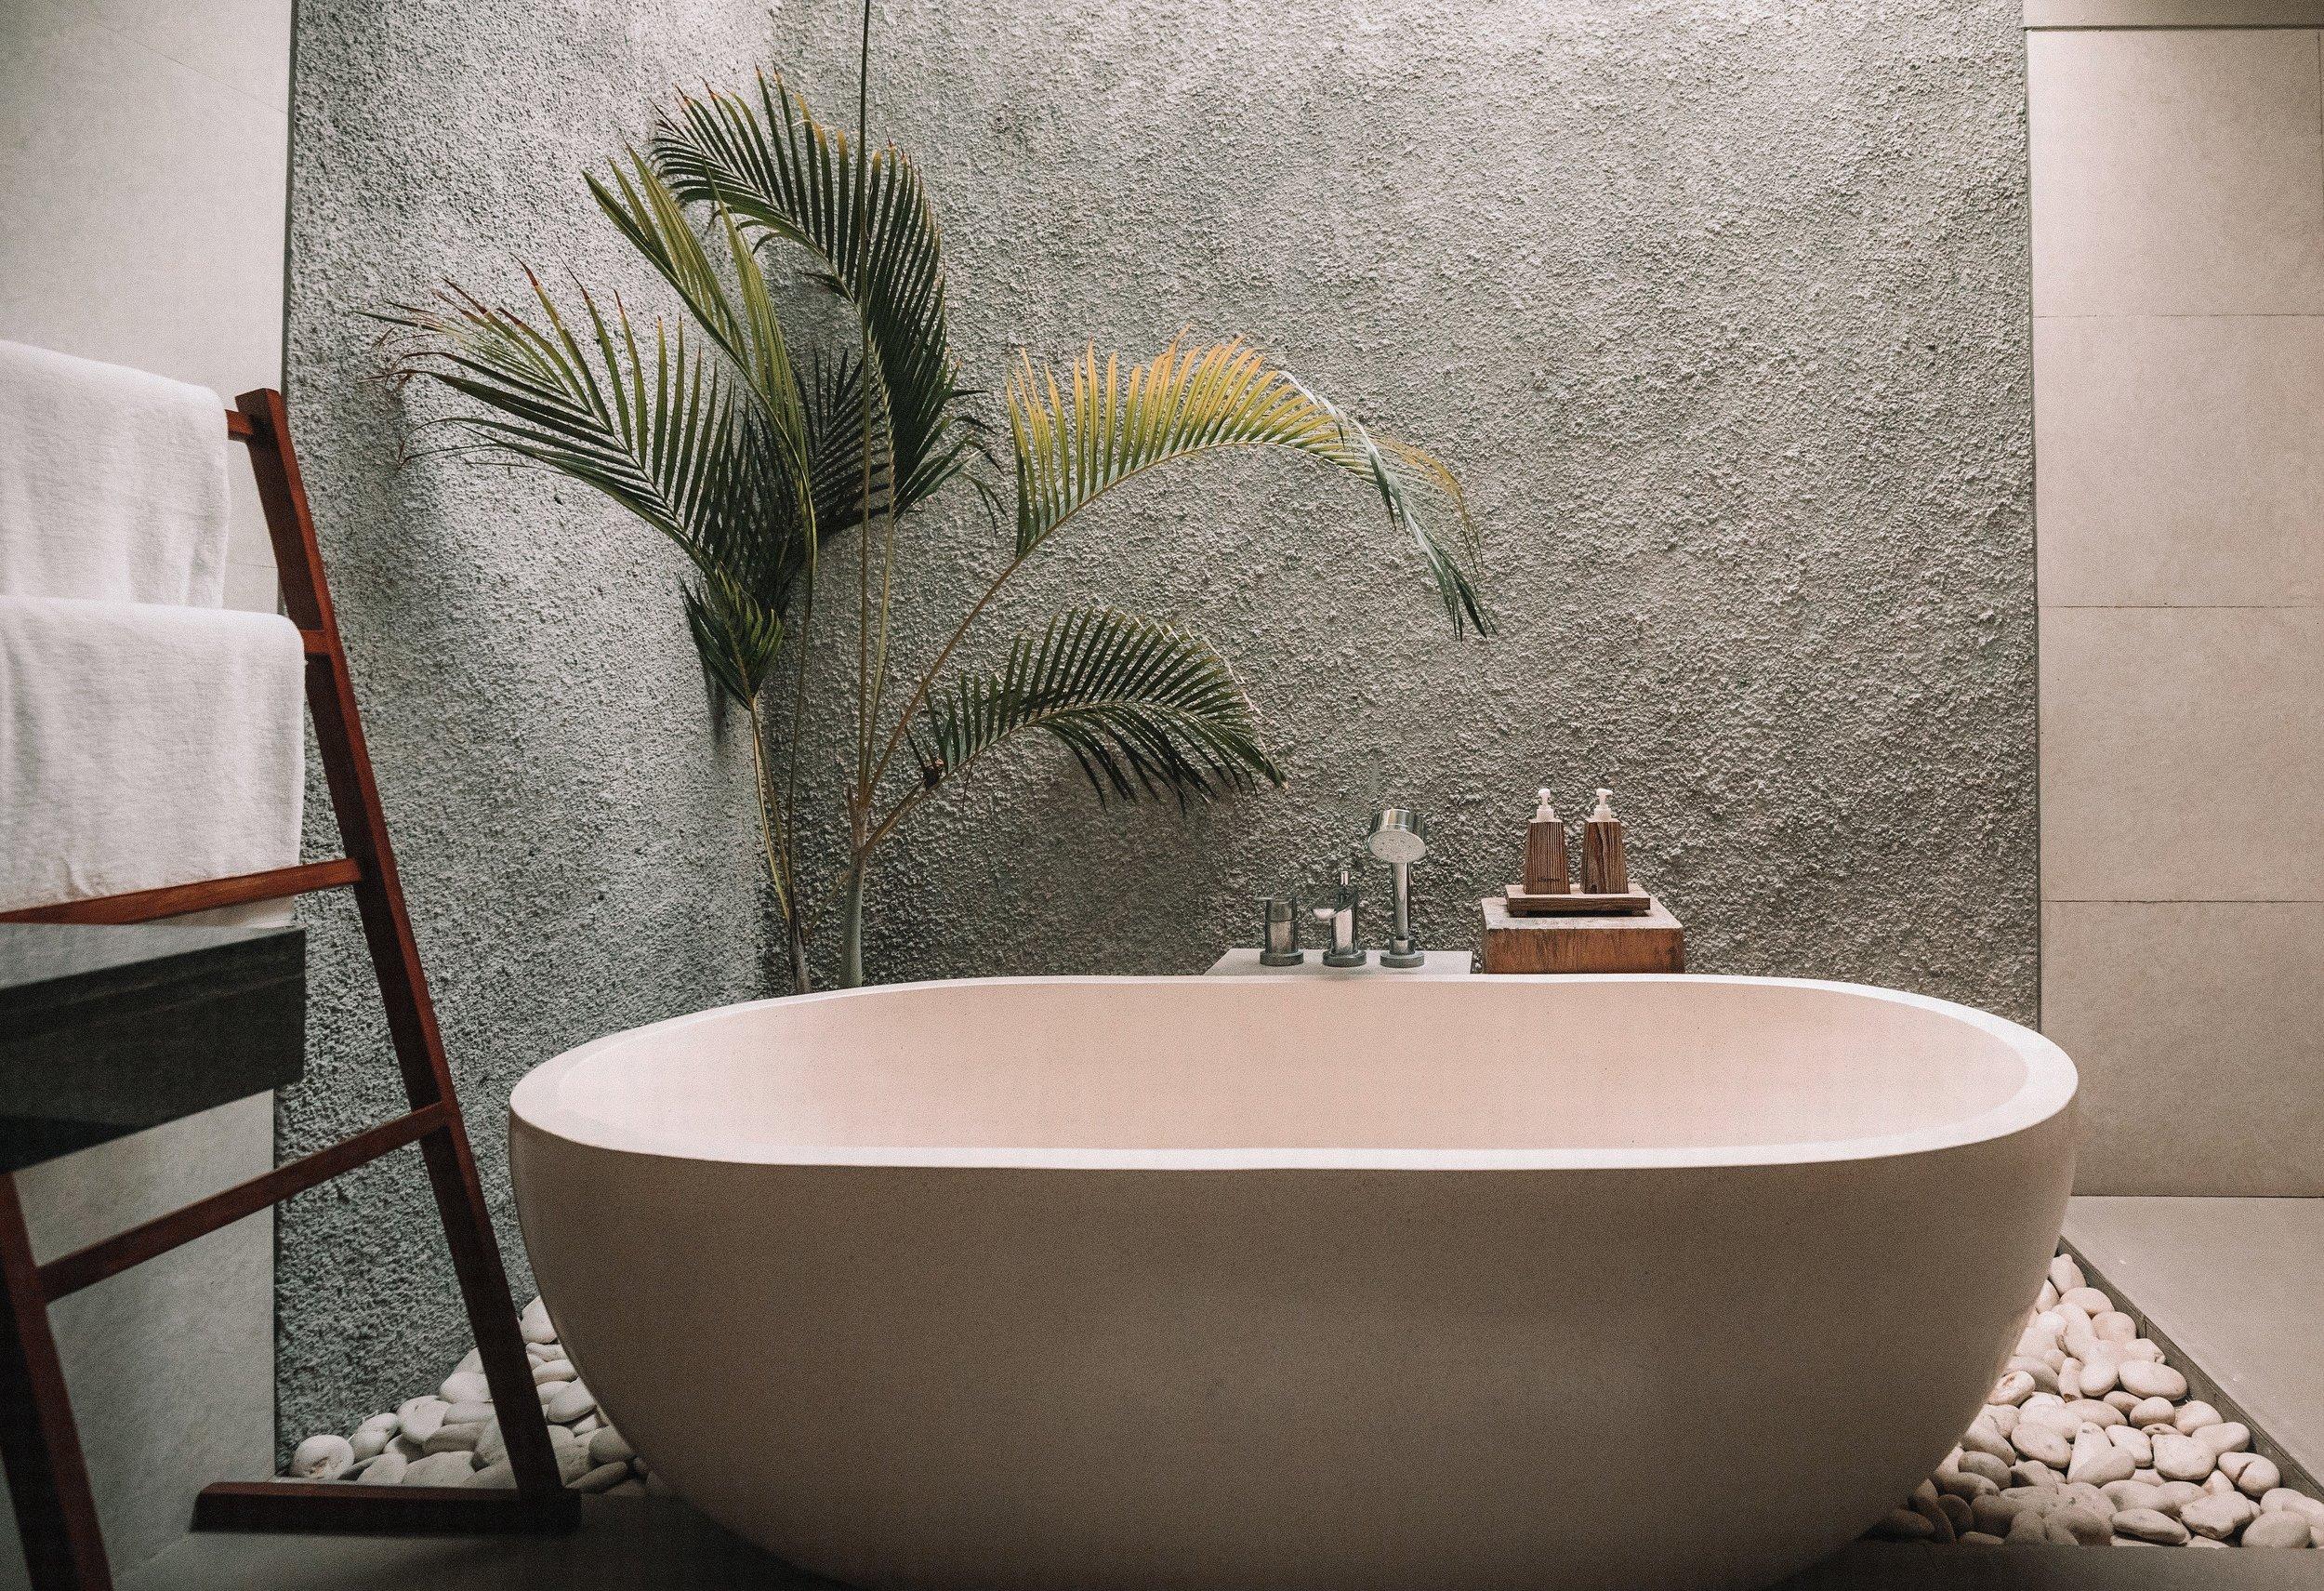 BathSoak_Tub_Website.jpg